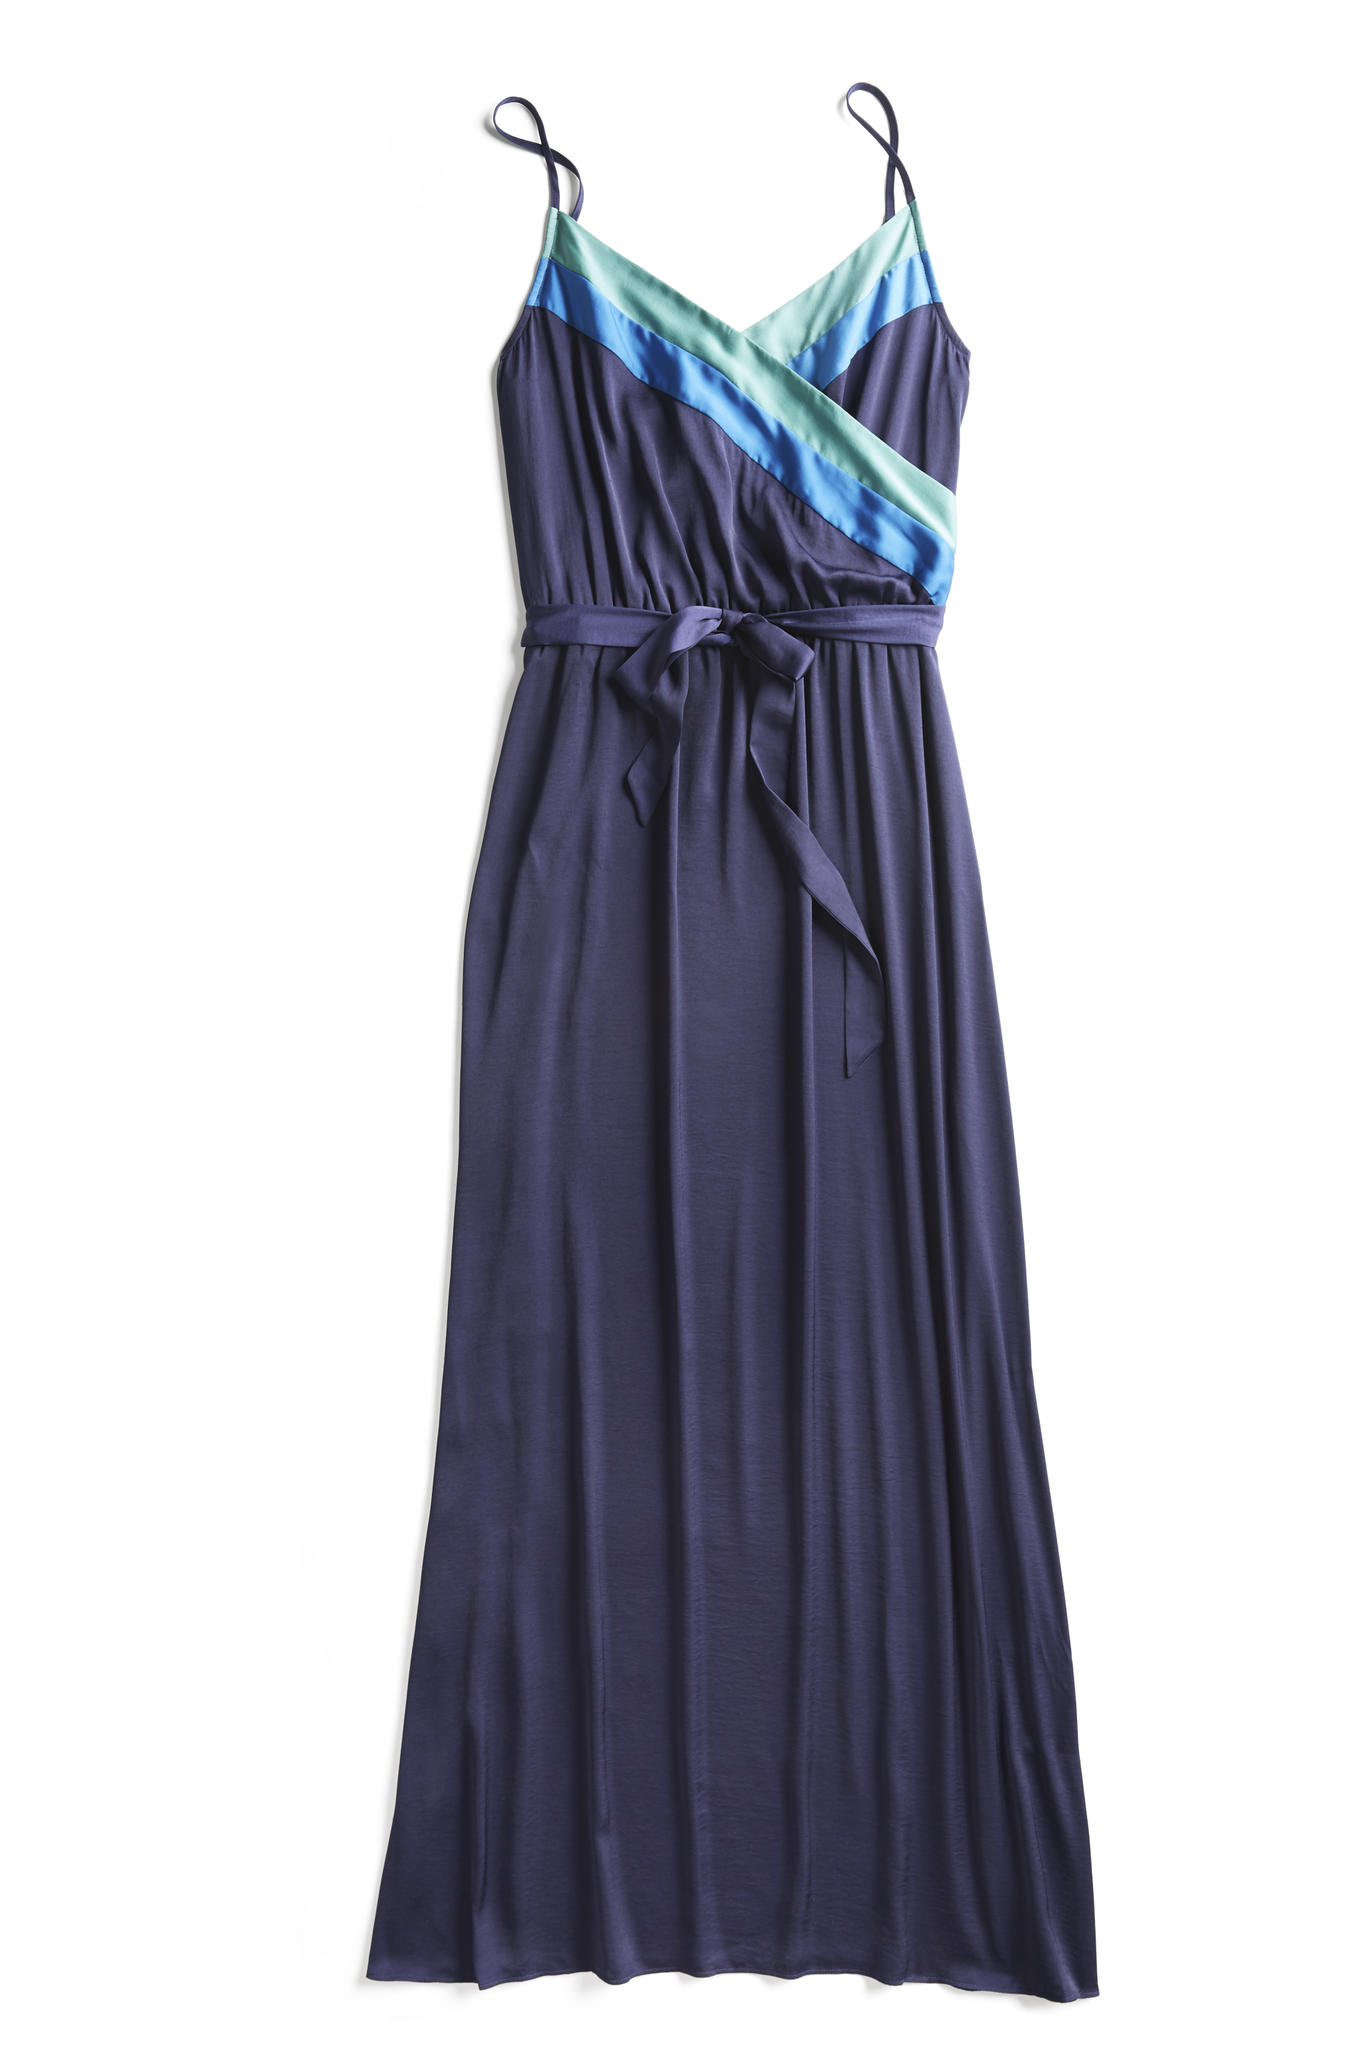 Stitch Fix Spring Stylist Picks: Casual blue maxi dress | STYLE ...